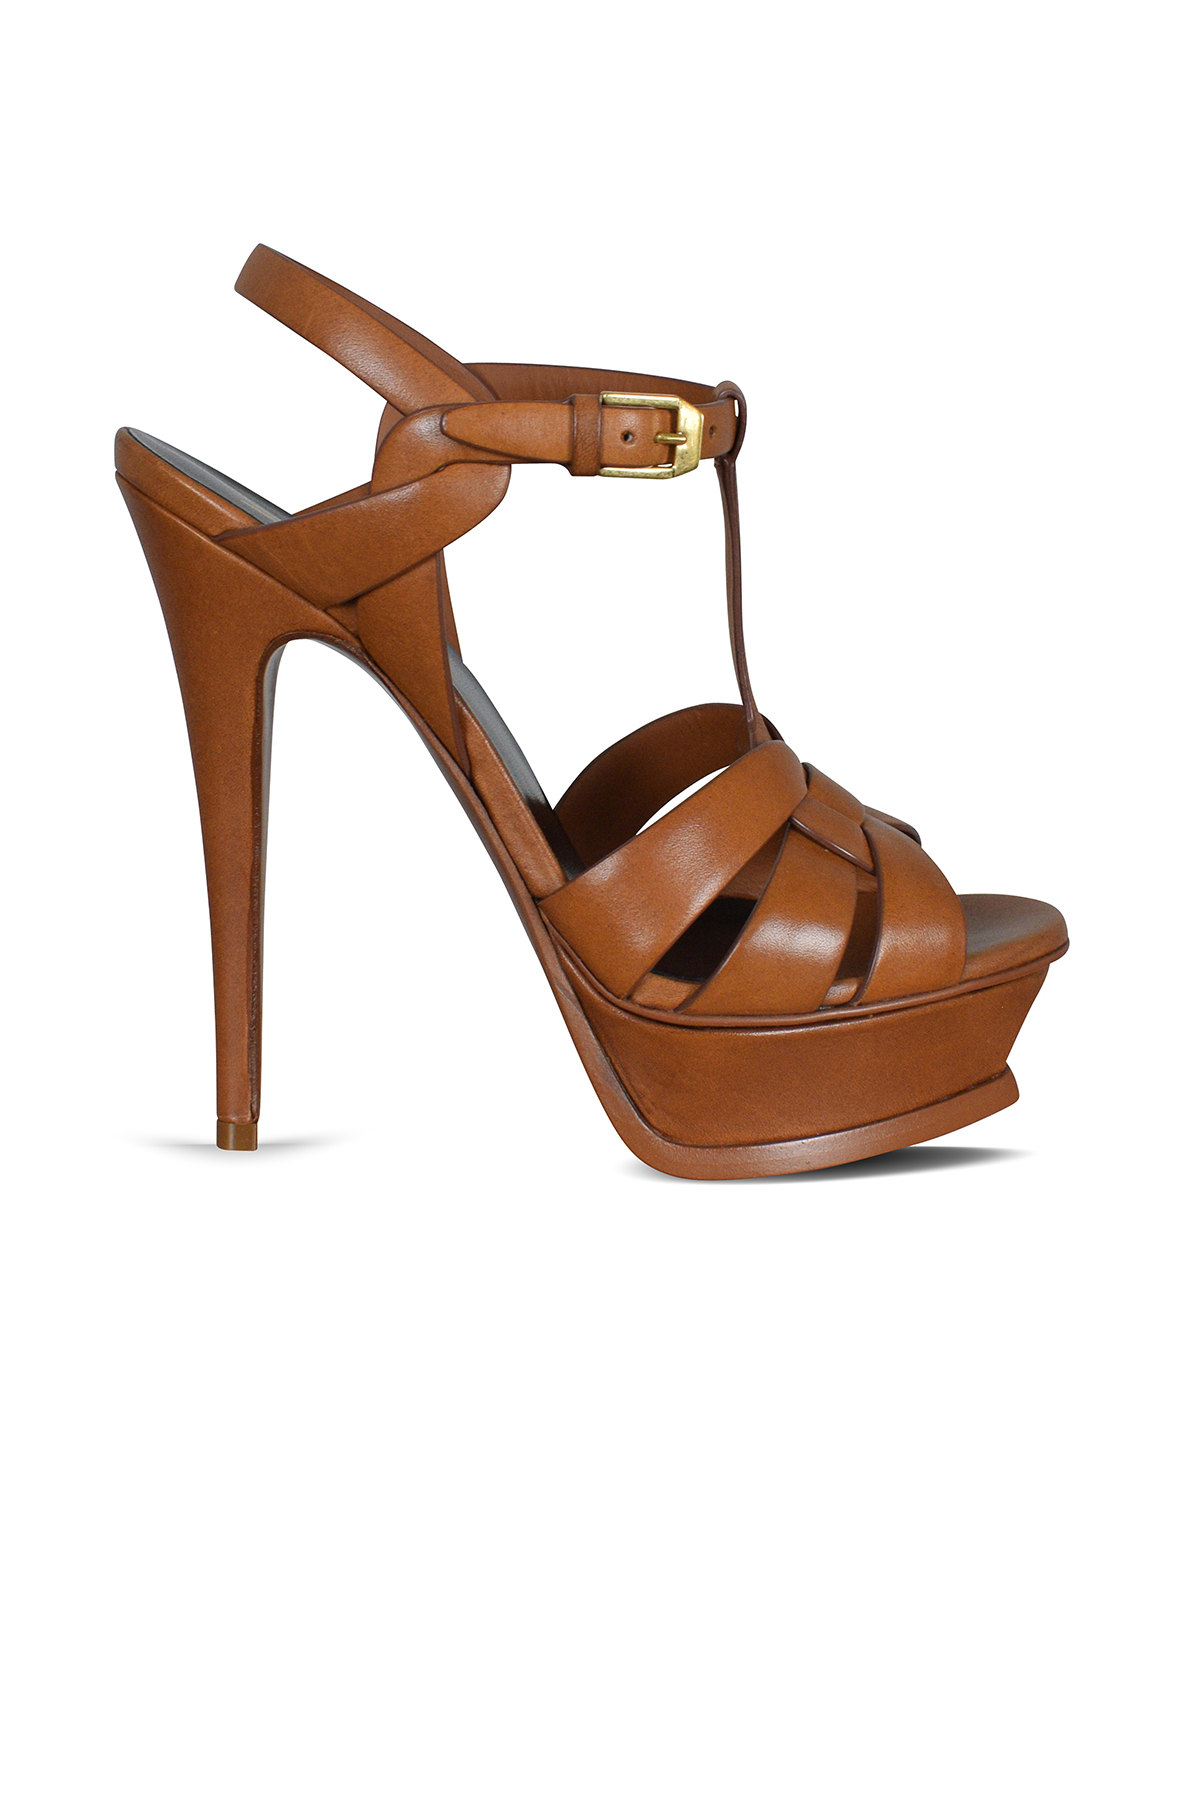 Tribute Saint Laurent sandals in gold leather.